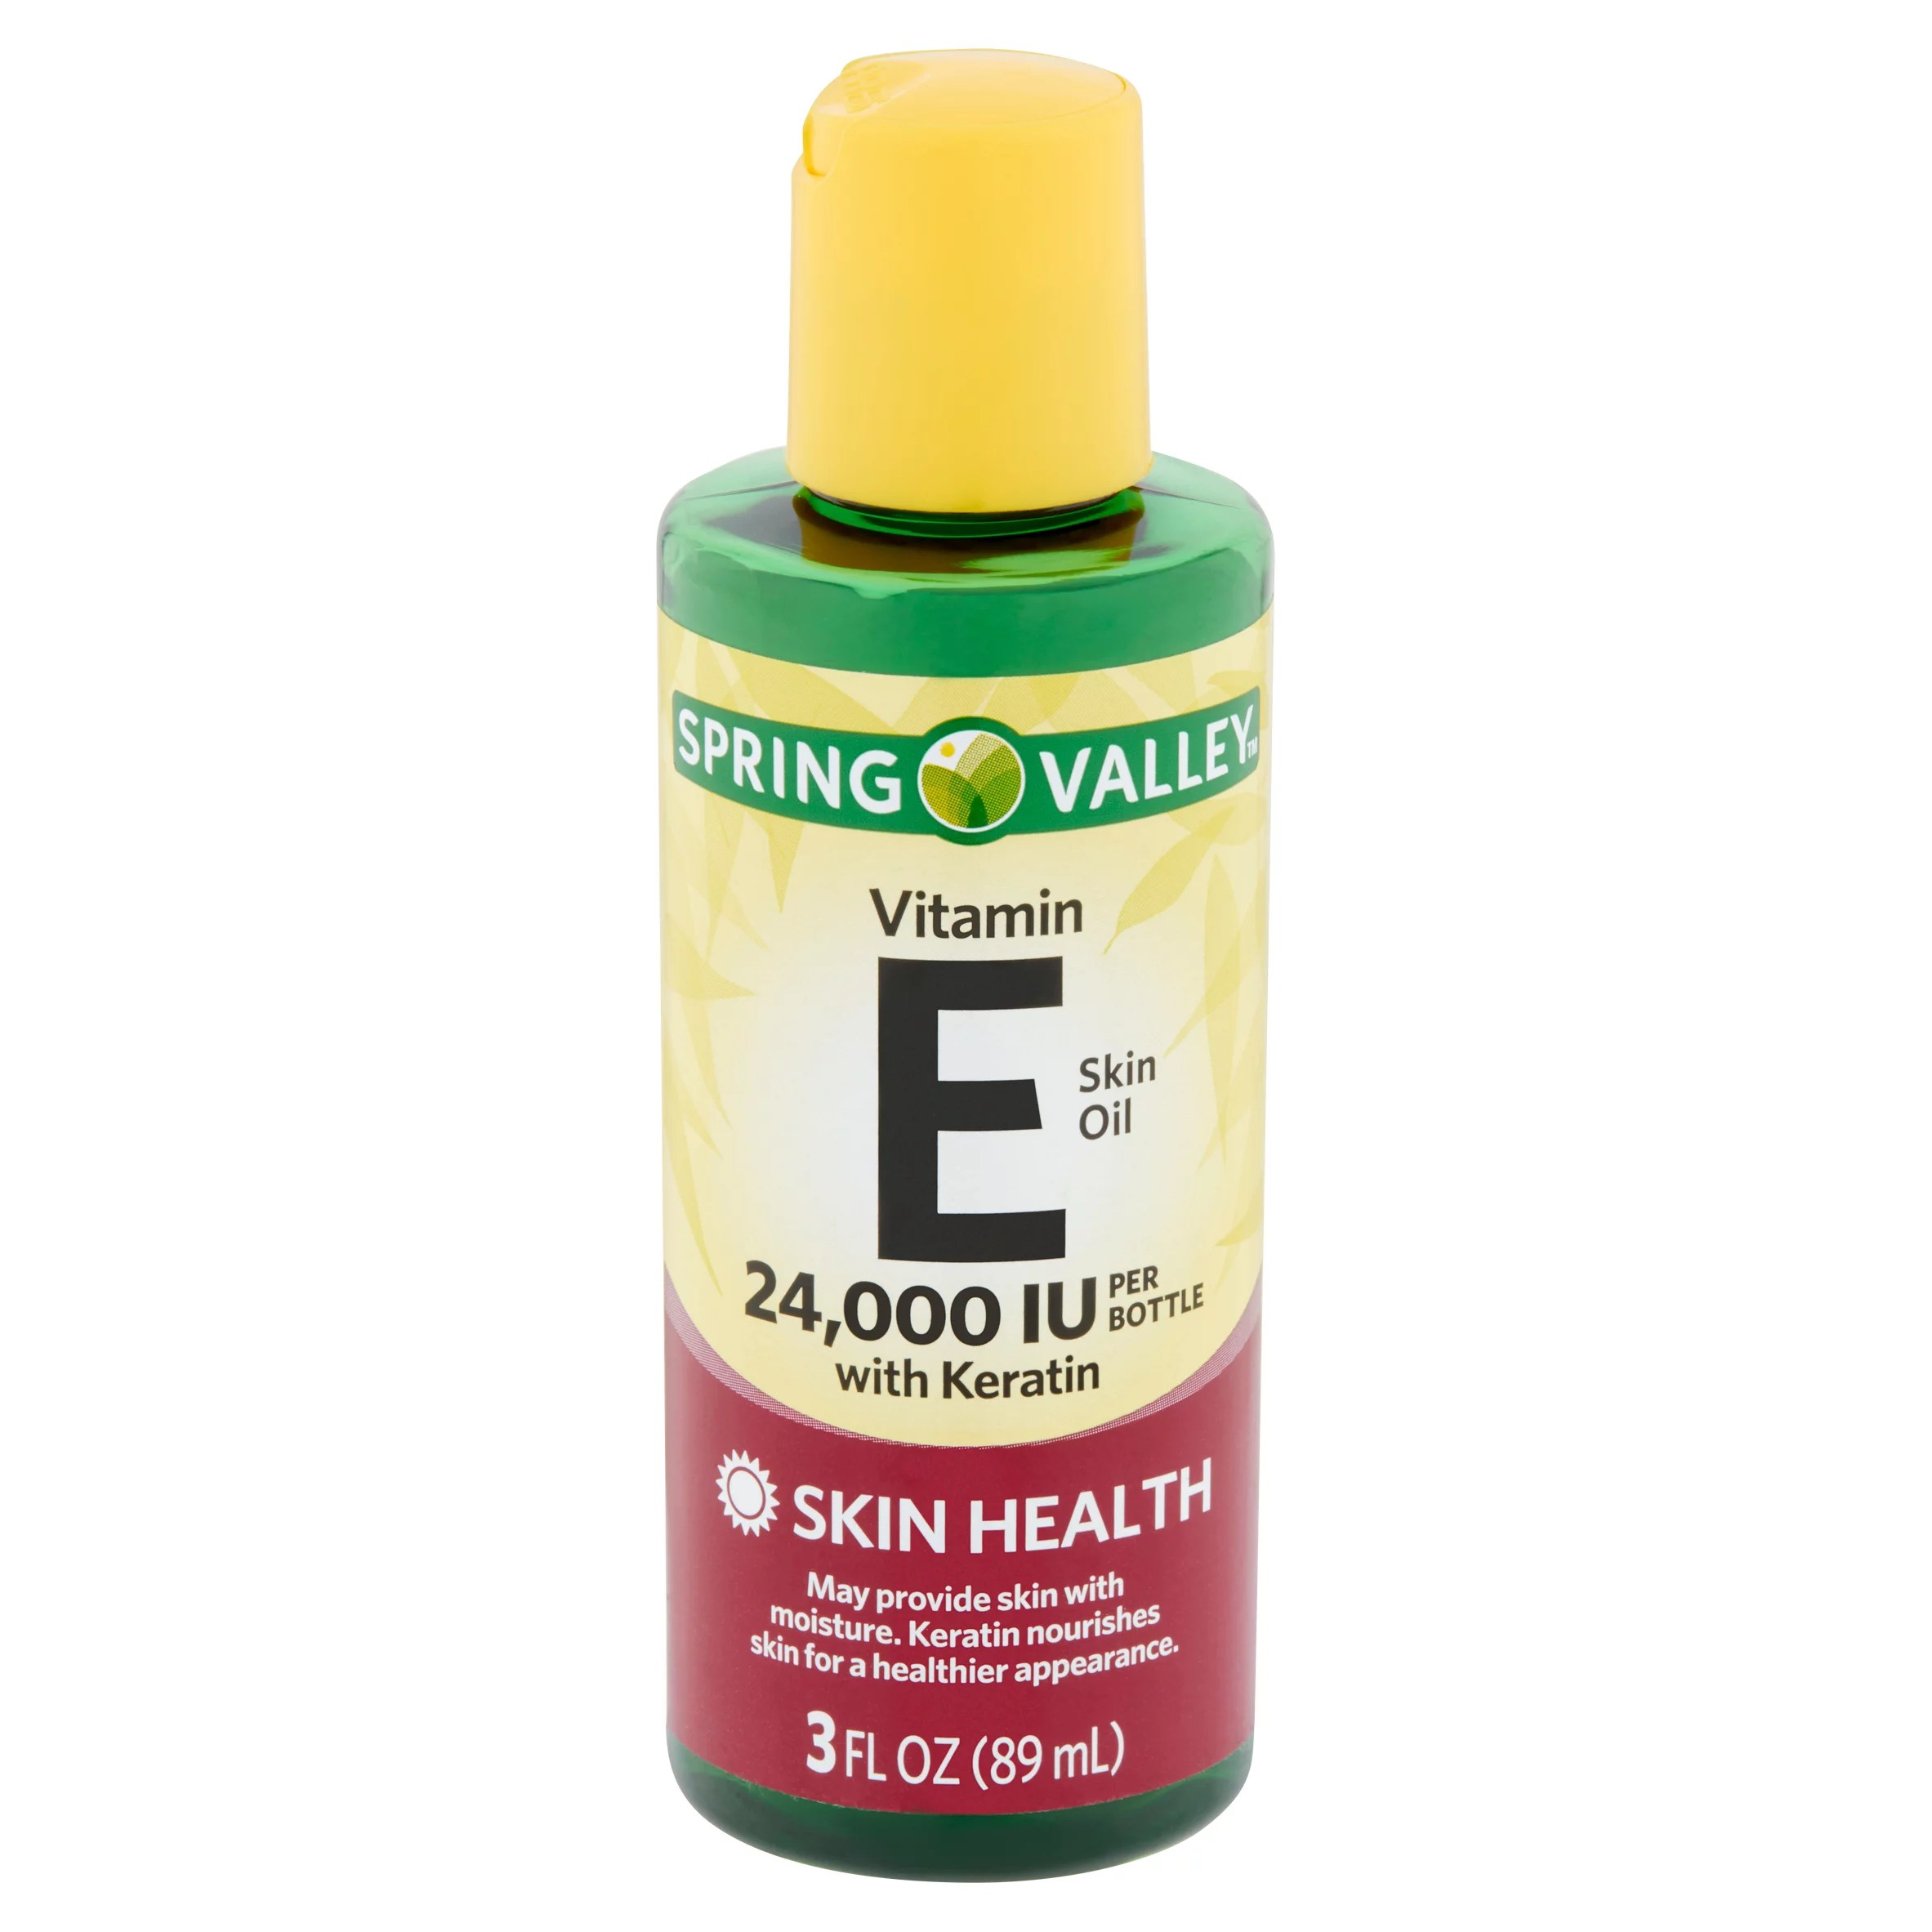 Spring Valley Vitamin E Skin Oil with Keratin, 24,000 IU, 3 fl oz